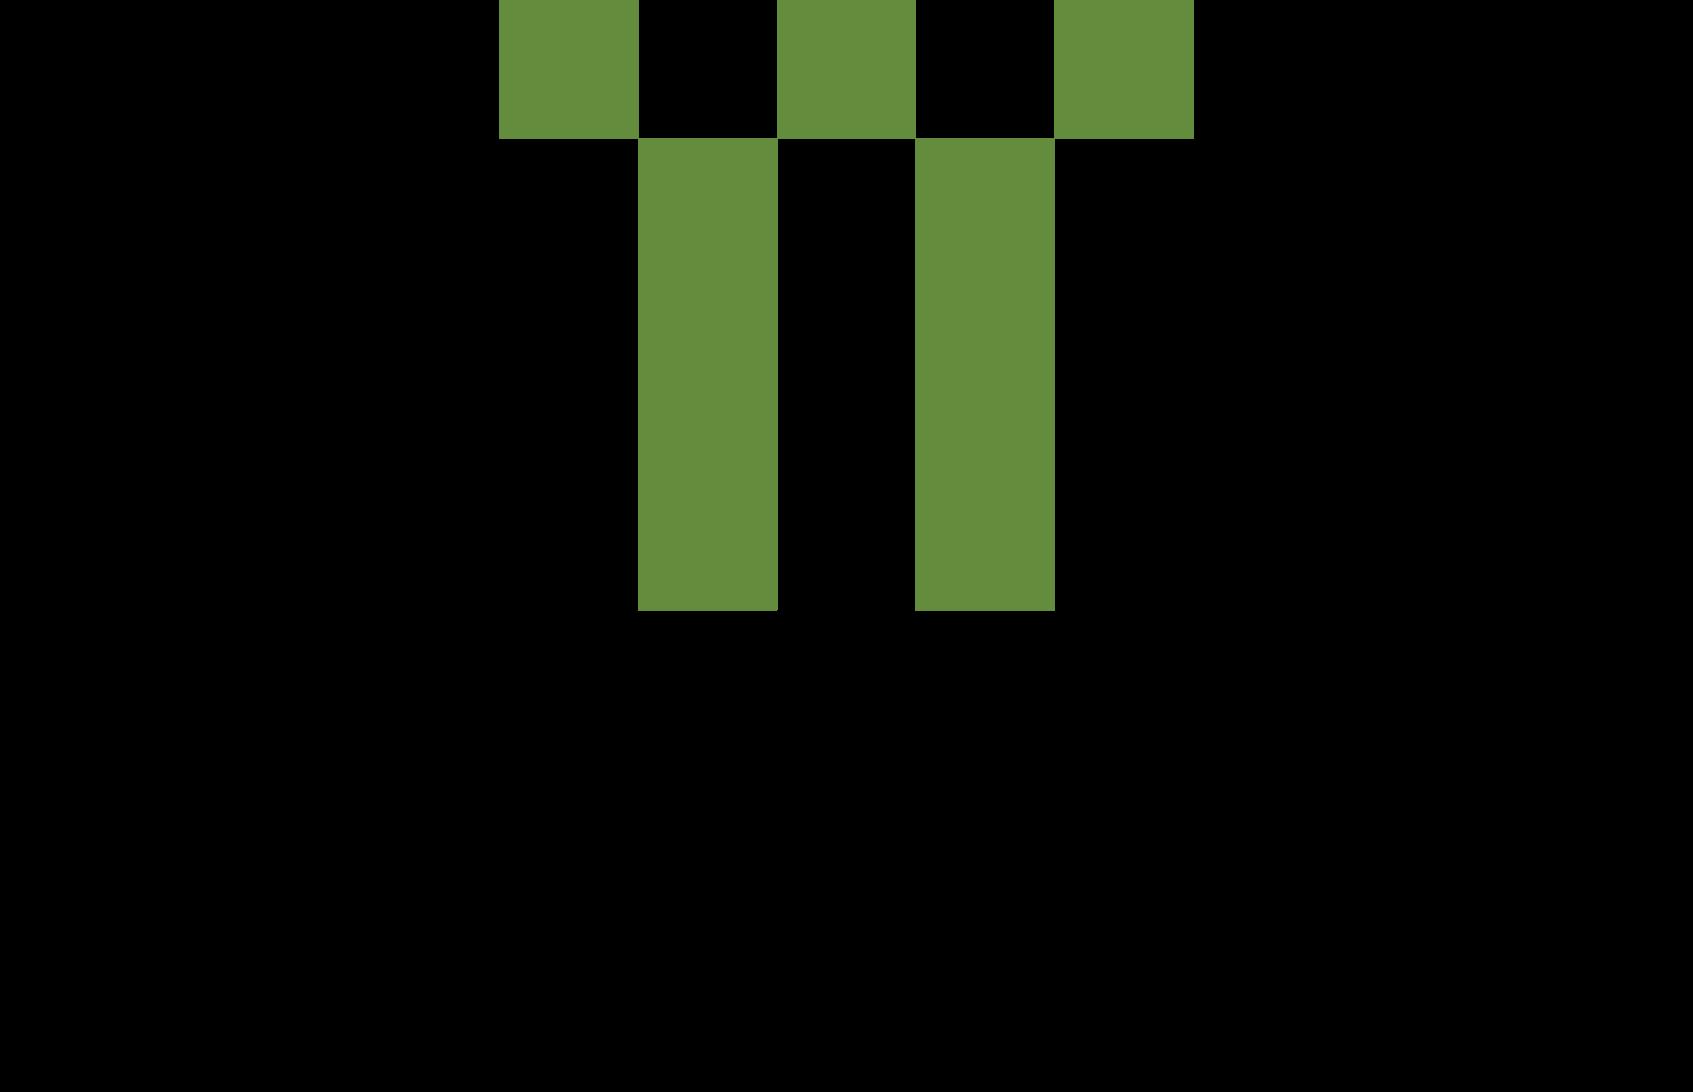 Green Treetop logo